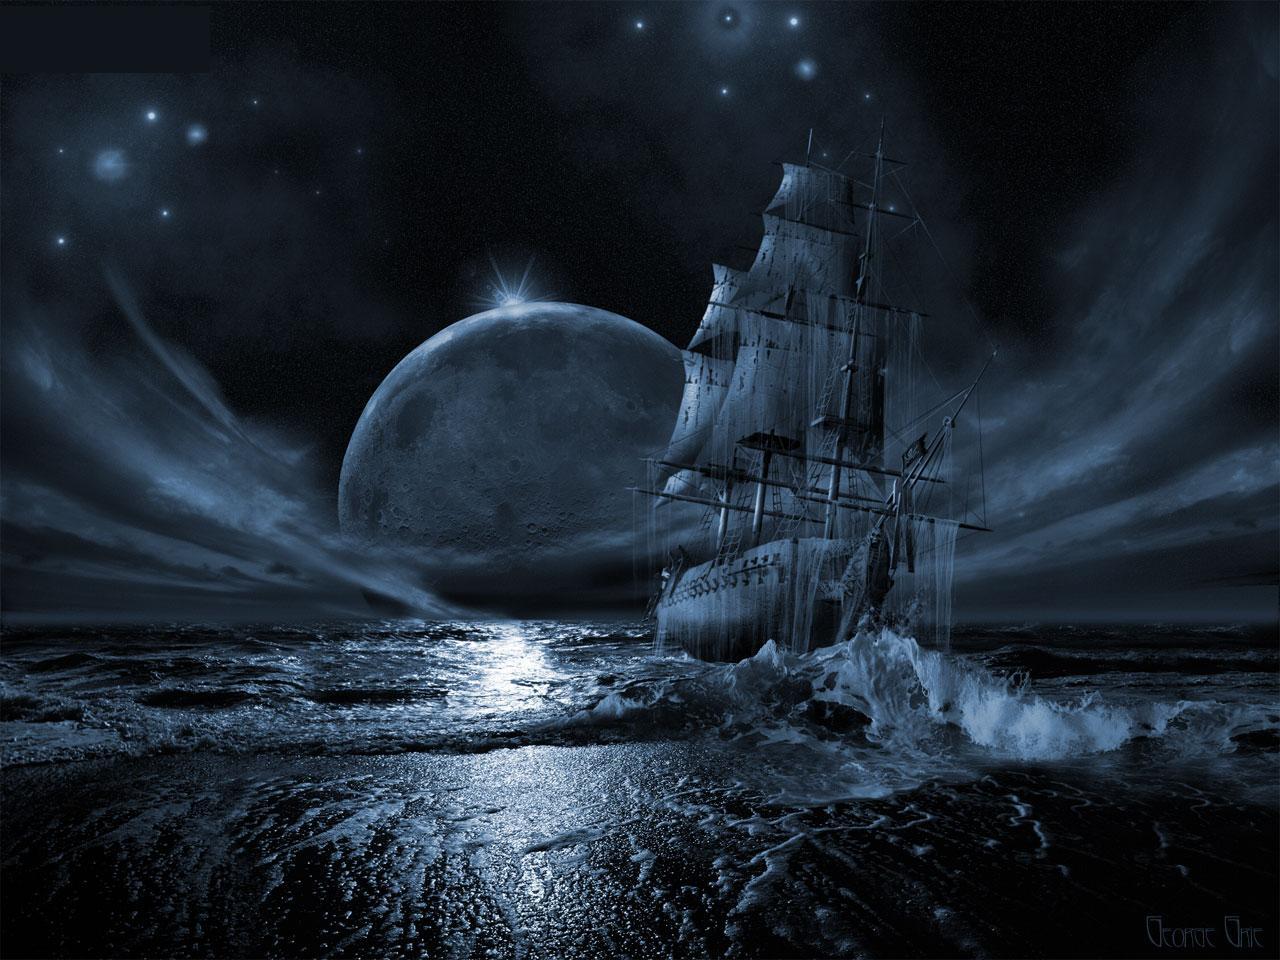 http://4.bp.blogspot.com/_7bYwCg_CcR4/S6ouvsjBiVI/AAAAAAAAAzk/aAuC6RjykWo/s1600/ghostship.jpg